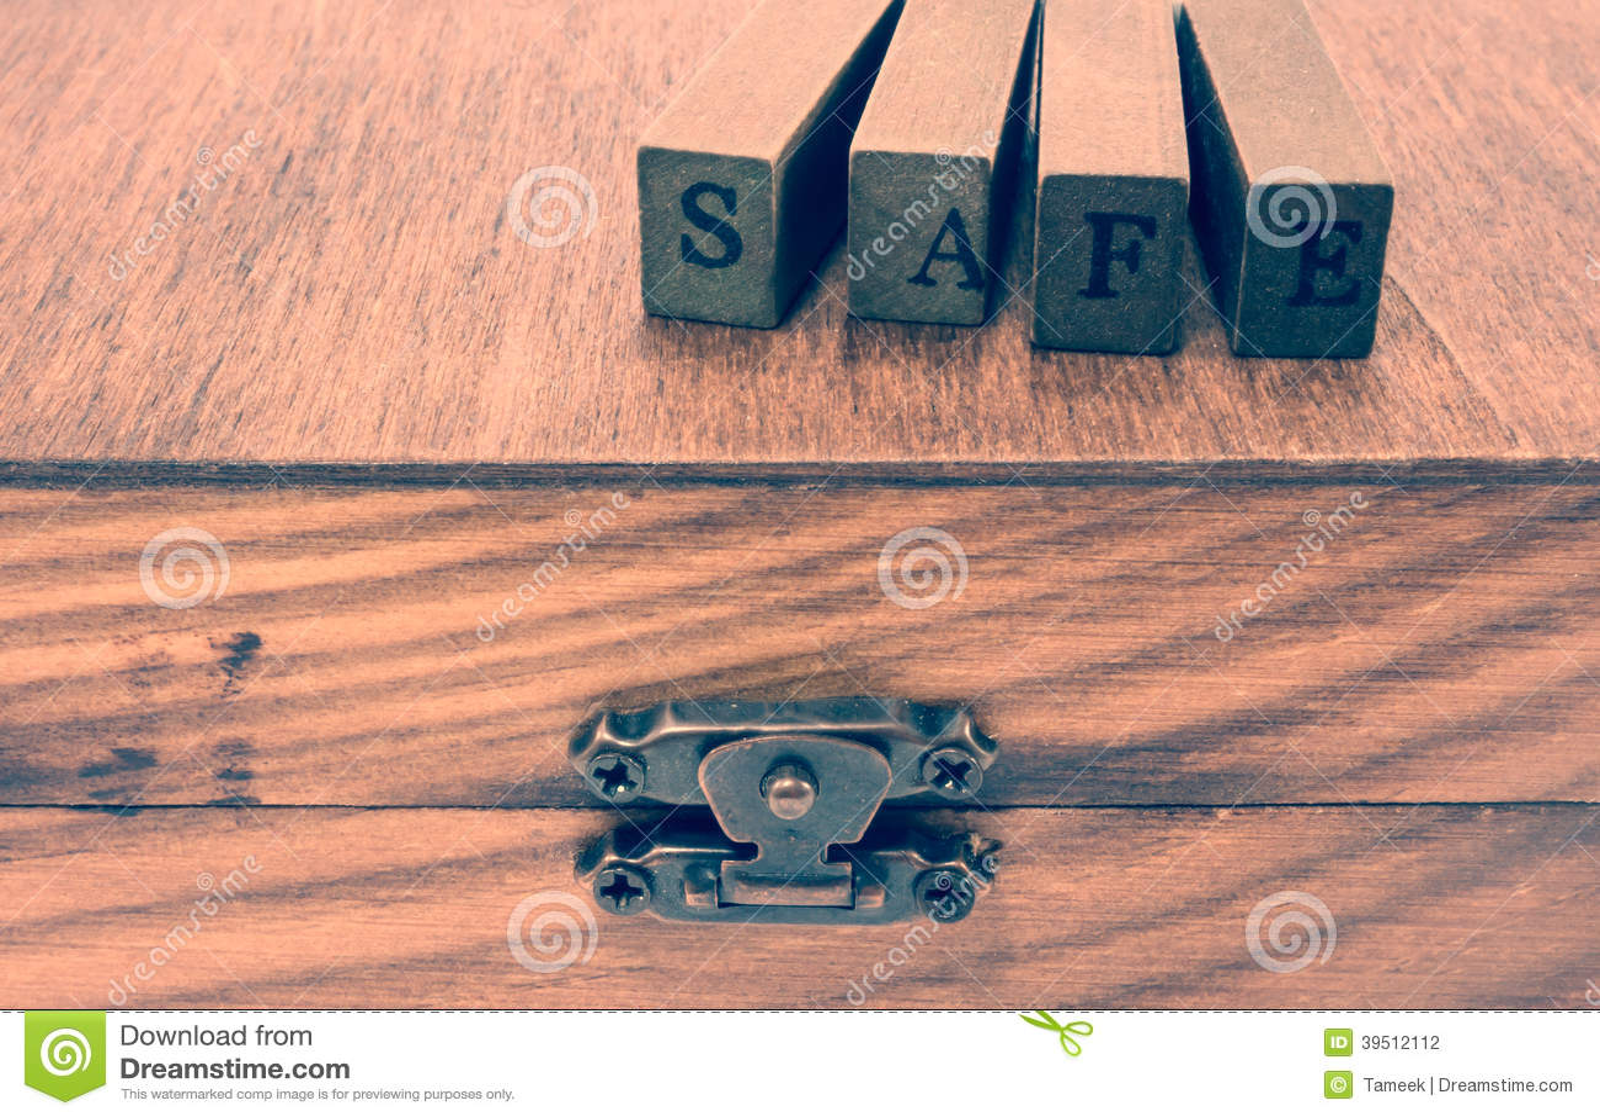 Safe concept